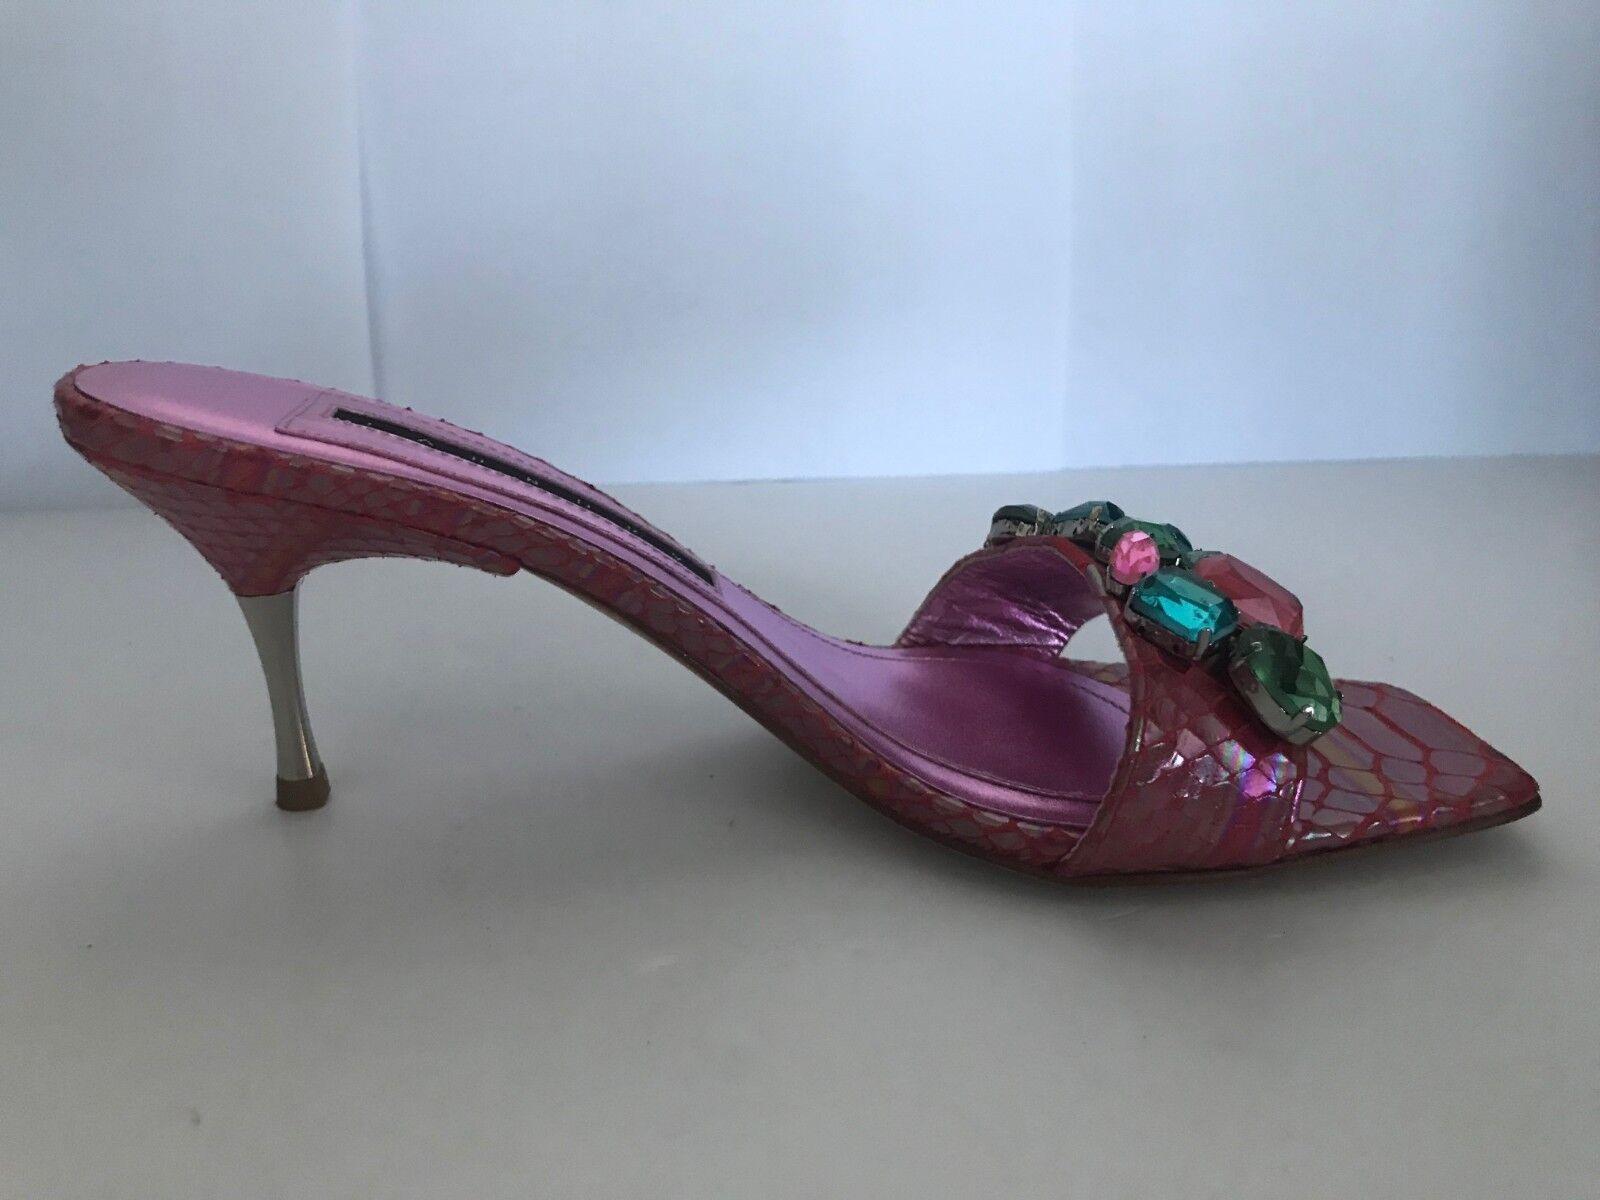 LAUNDRY By Vero SHELLI SEGAL Vero By Cuoio Slides Kitten Heels w  Rhinestones accent 7d926b